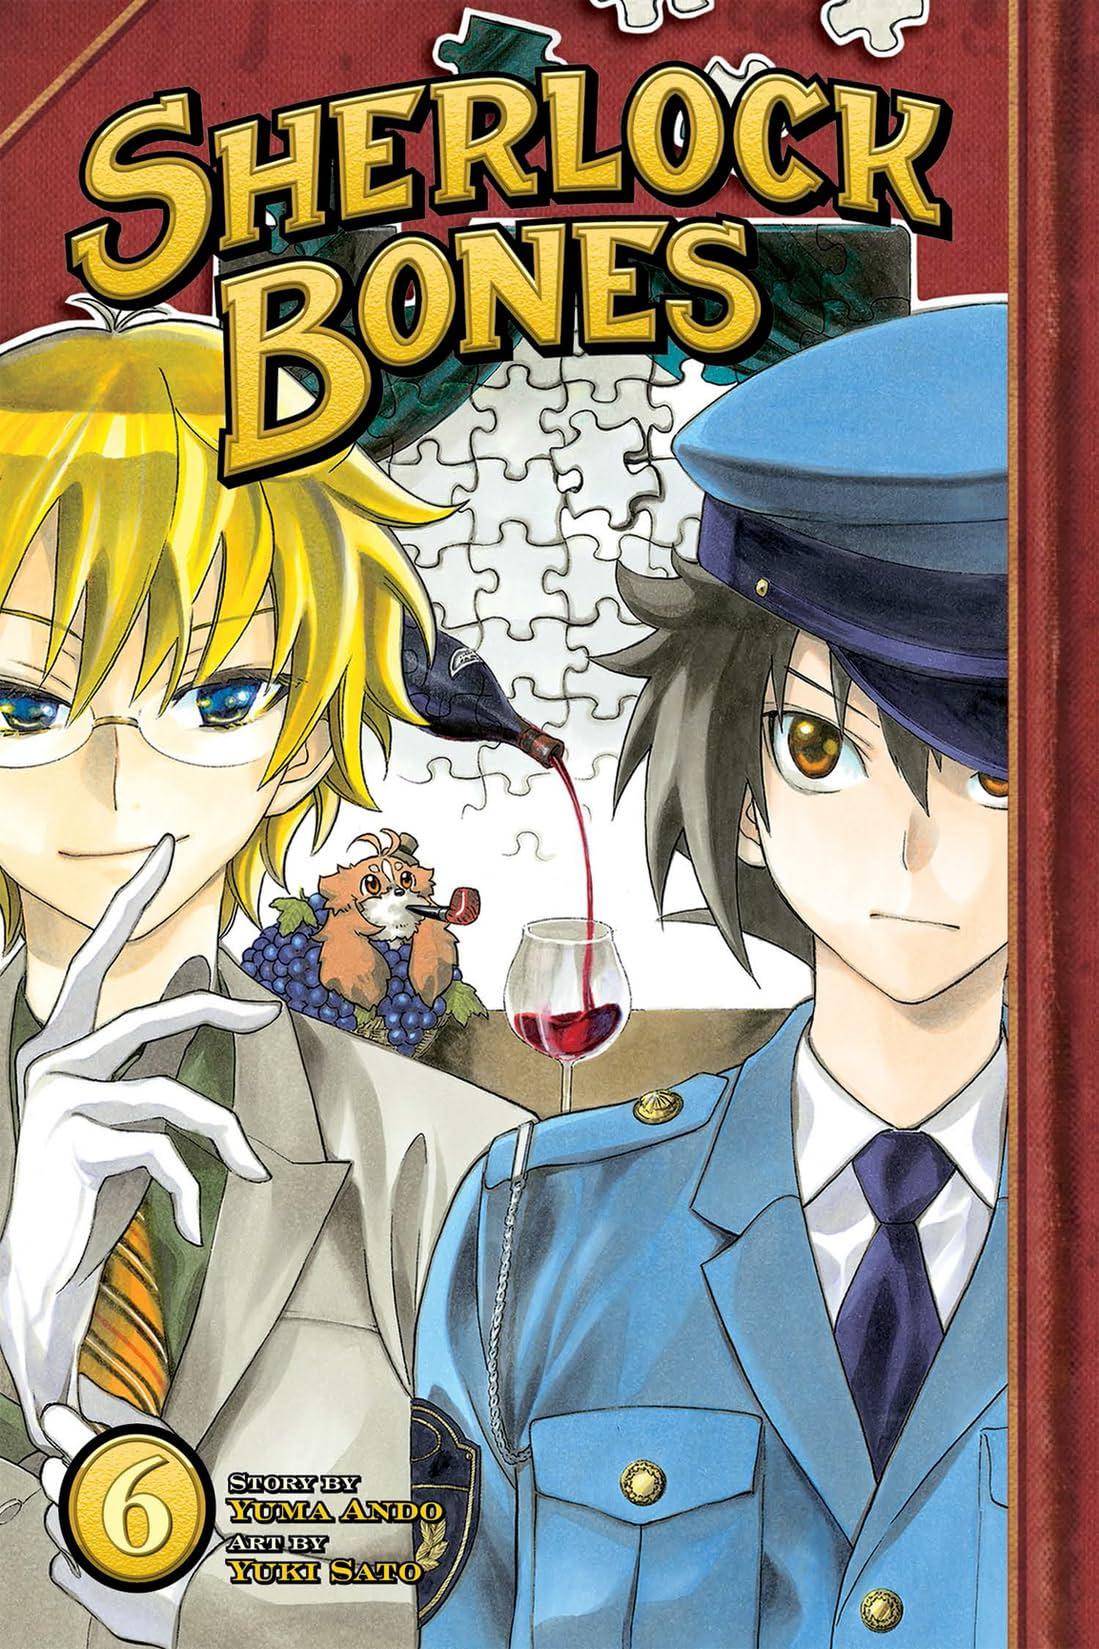 Sherlock Bones Vol. 6